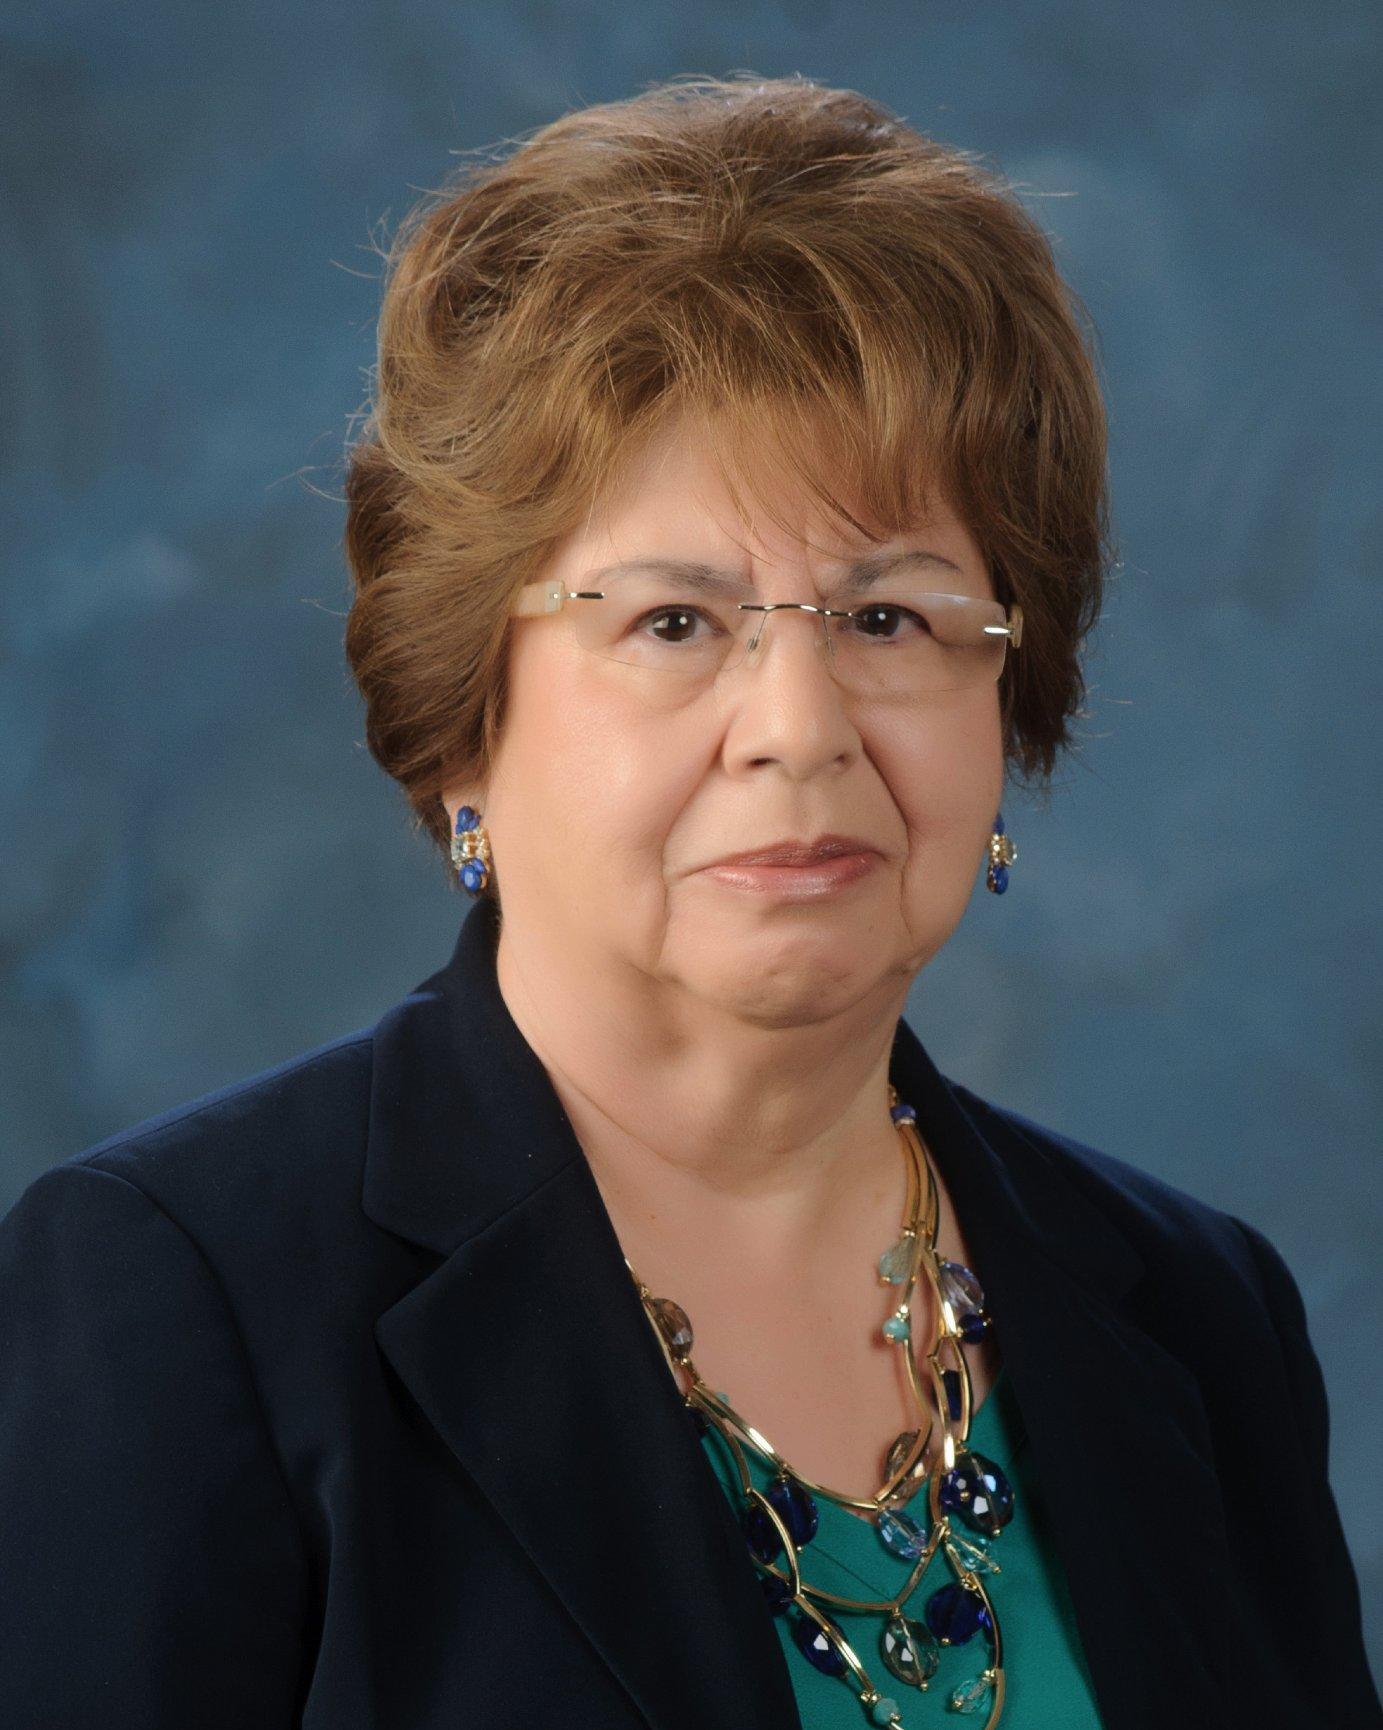 ELENA E. LEAL Financial Professional & Insurance Agent